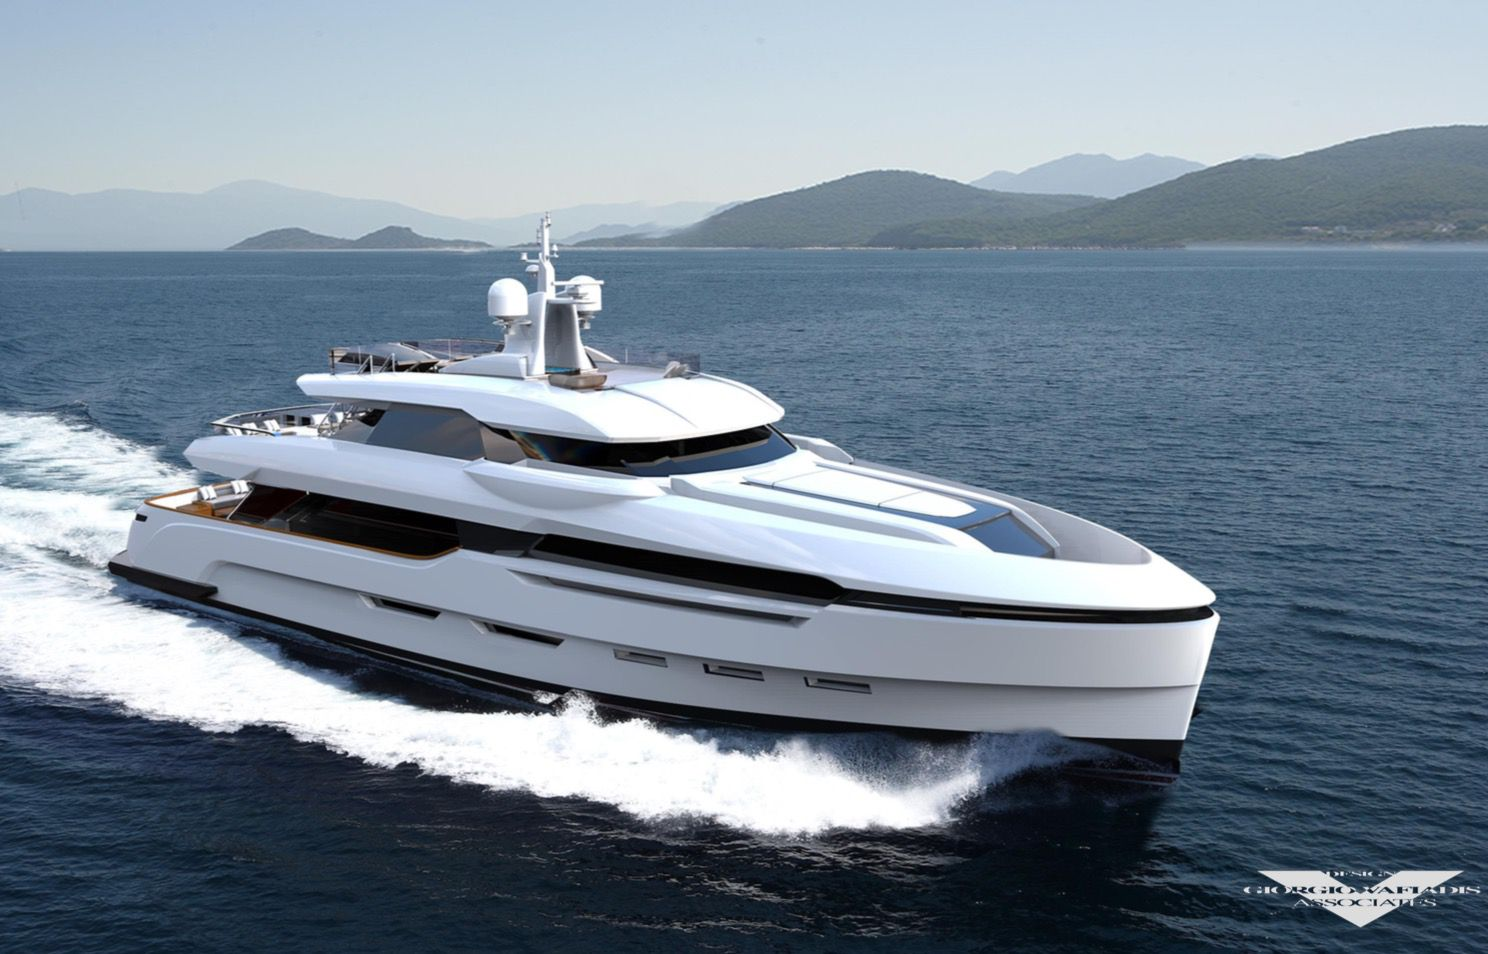 Luxury yacht for Sale   CCN 33m DOM by CCN - Cerri Cantieri Navali